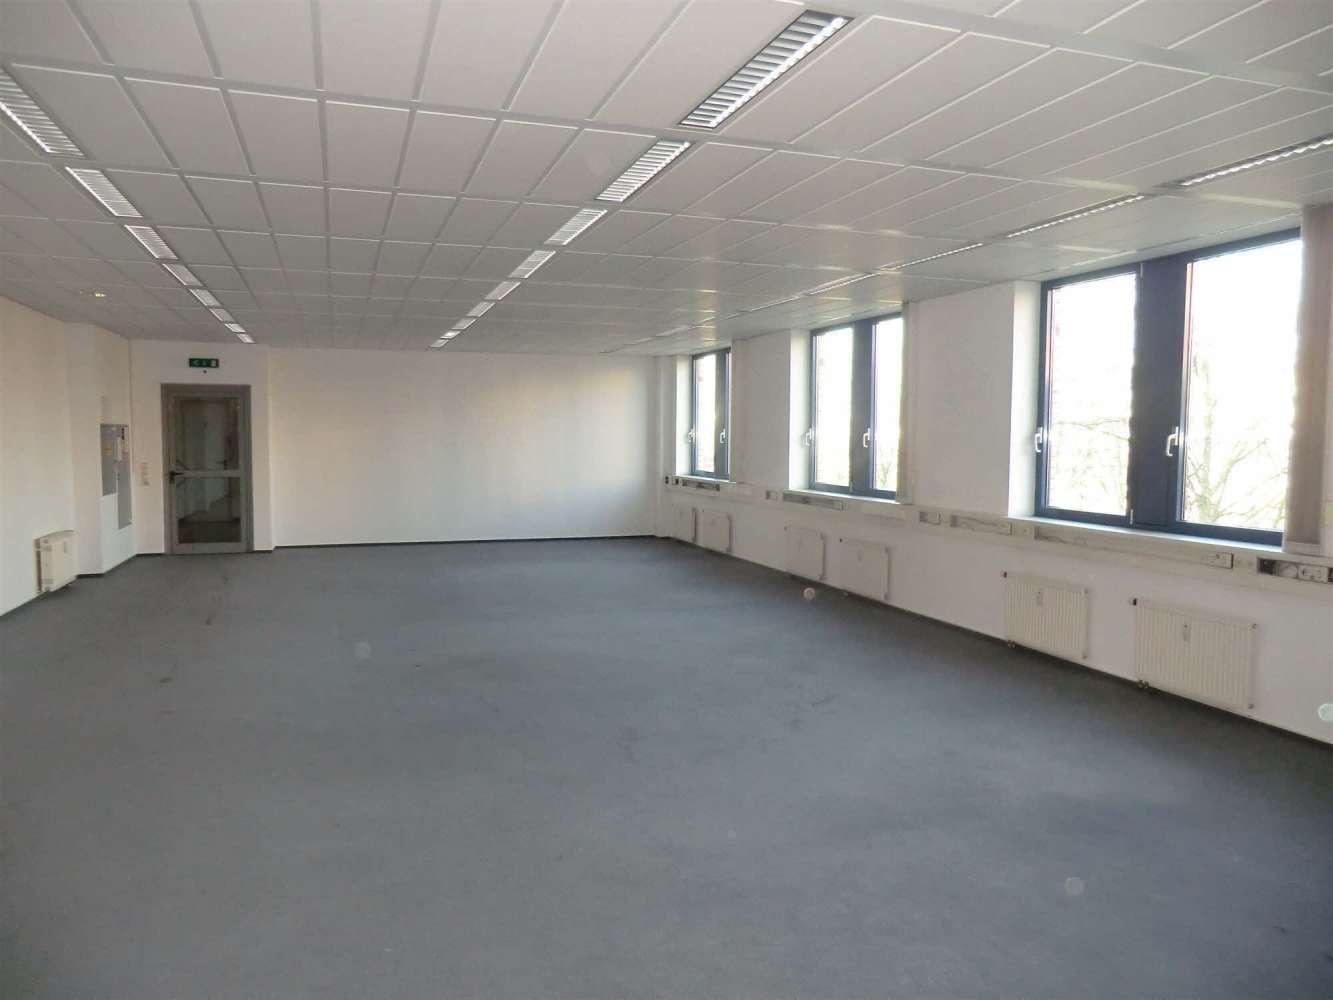 Büros Langen (hessen), 63225 - Büro - Langen (Hessen), Industriegebiet - F0169 - 9406032